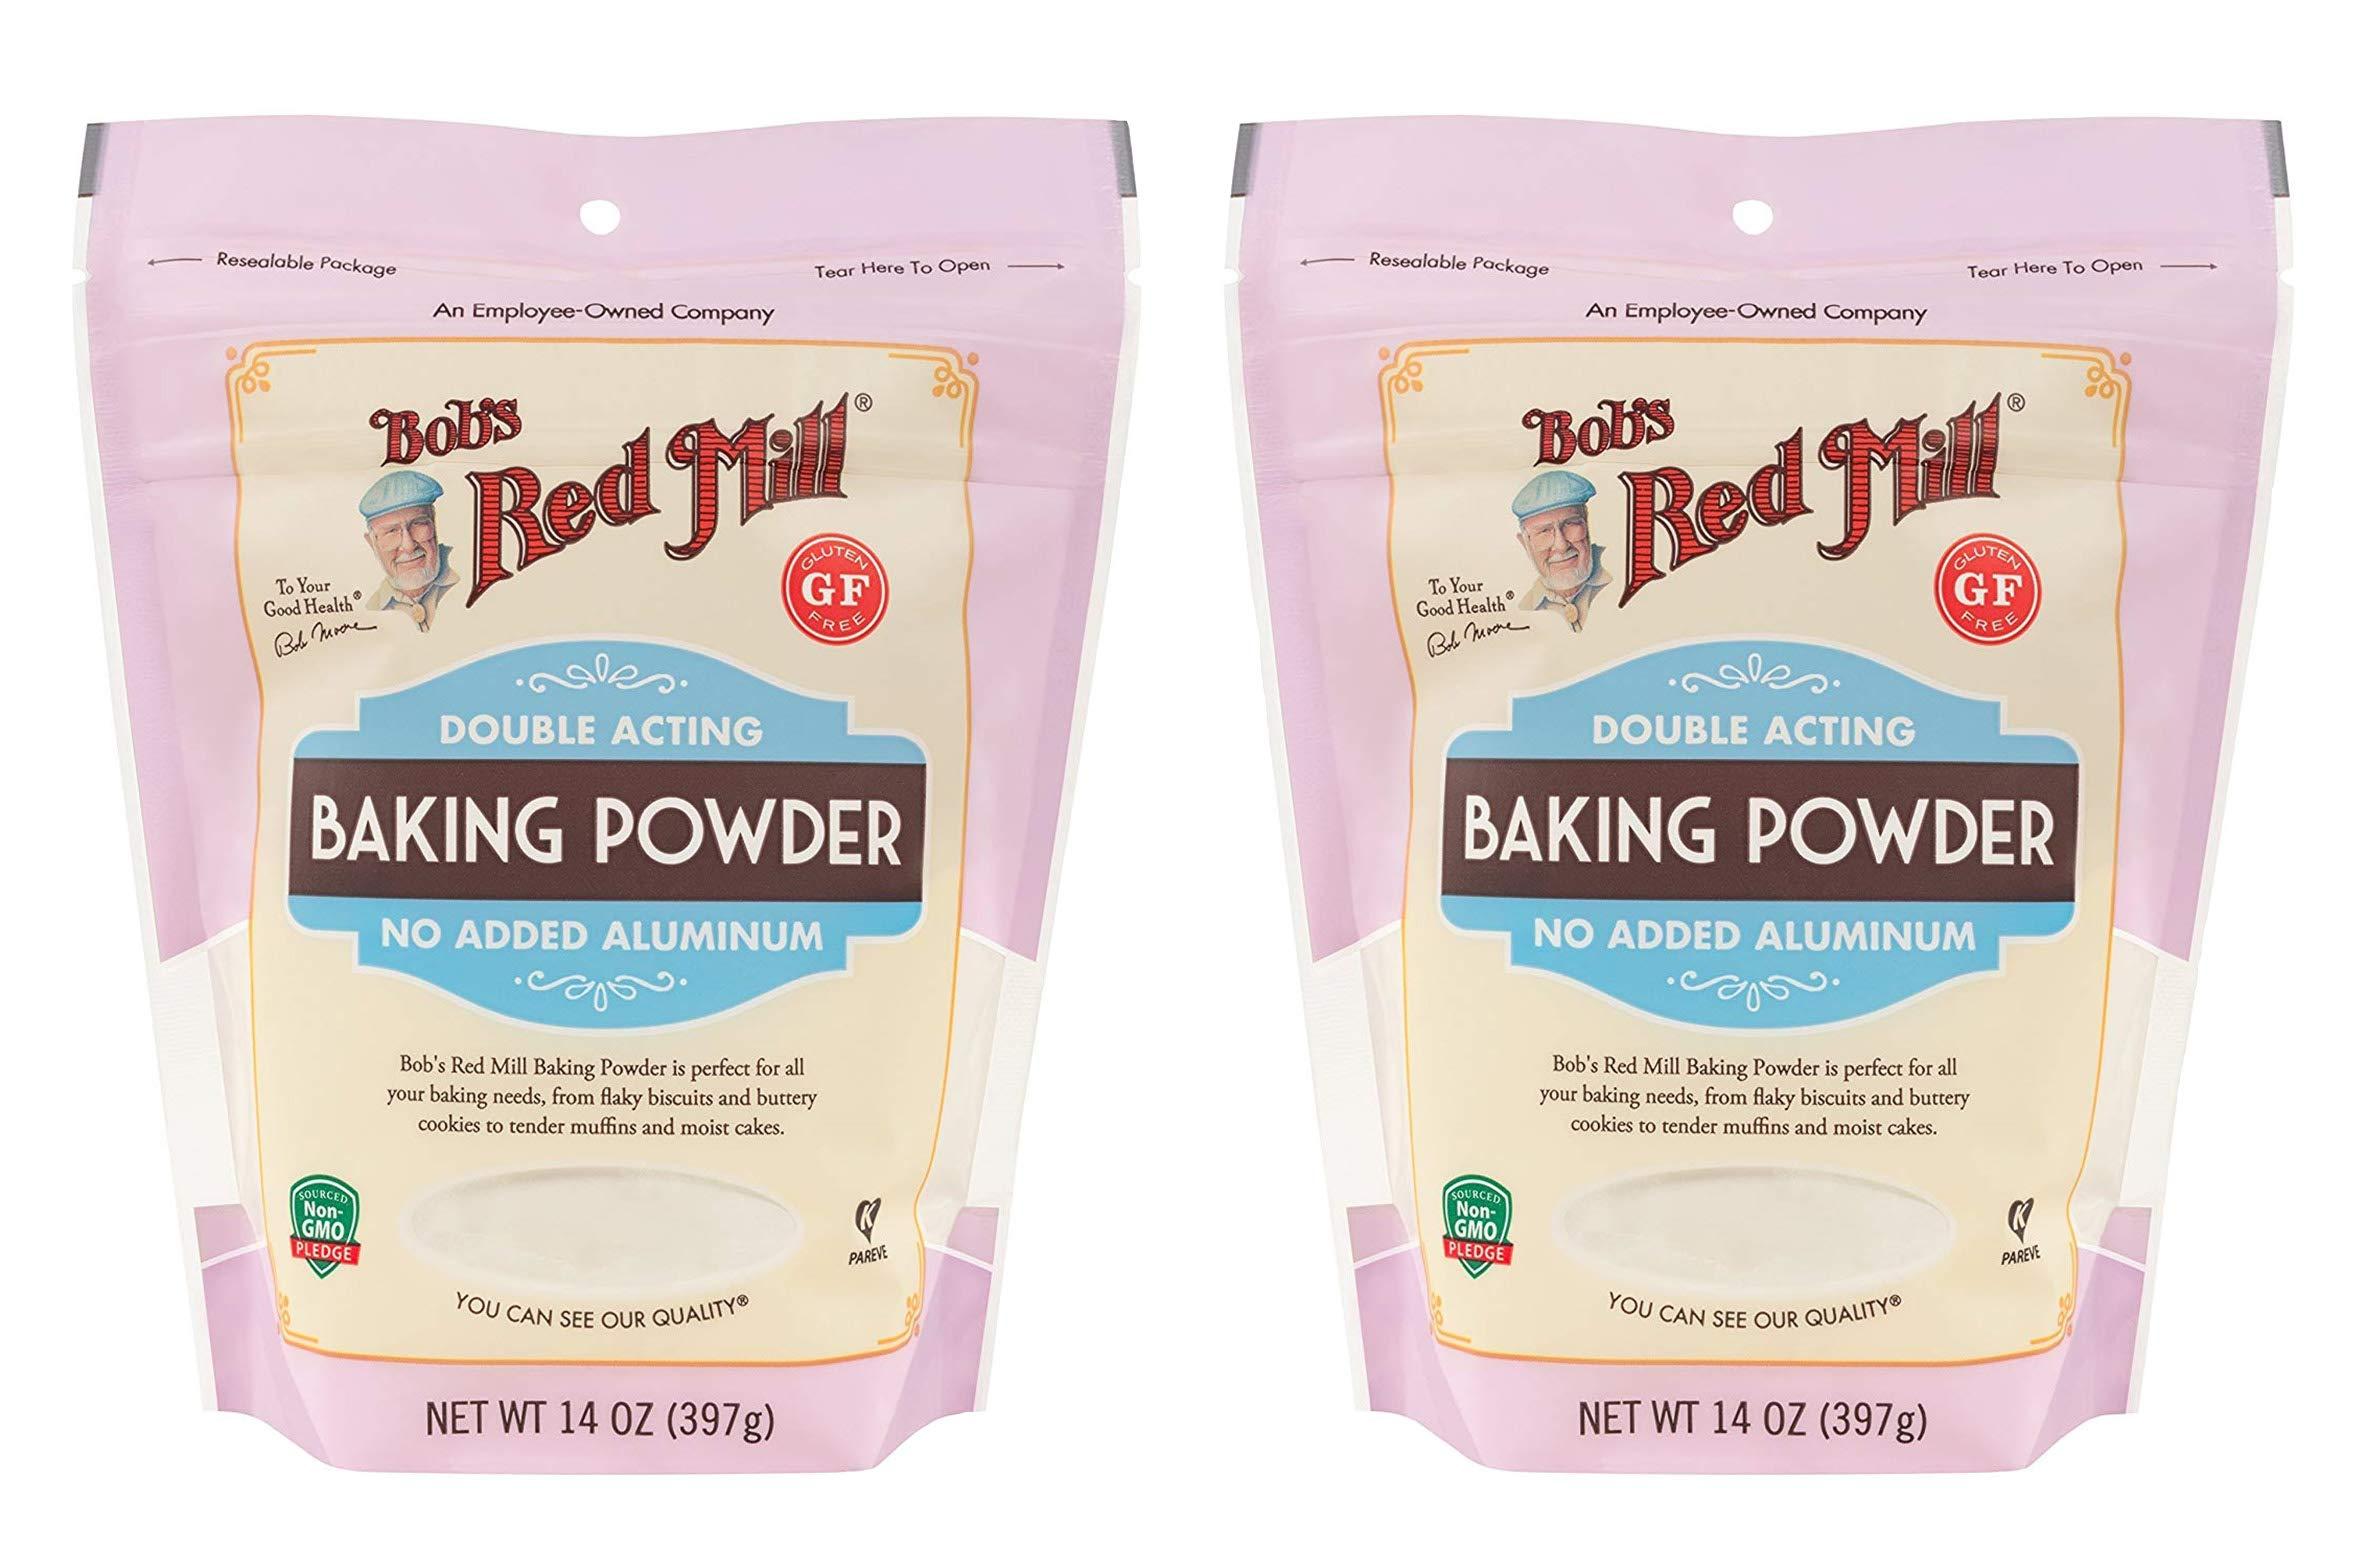 Bob's Red Mill Baking Powder, 14 Oz